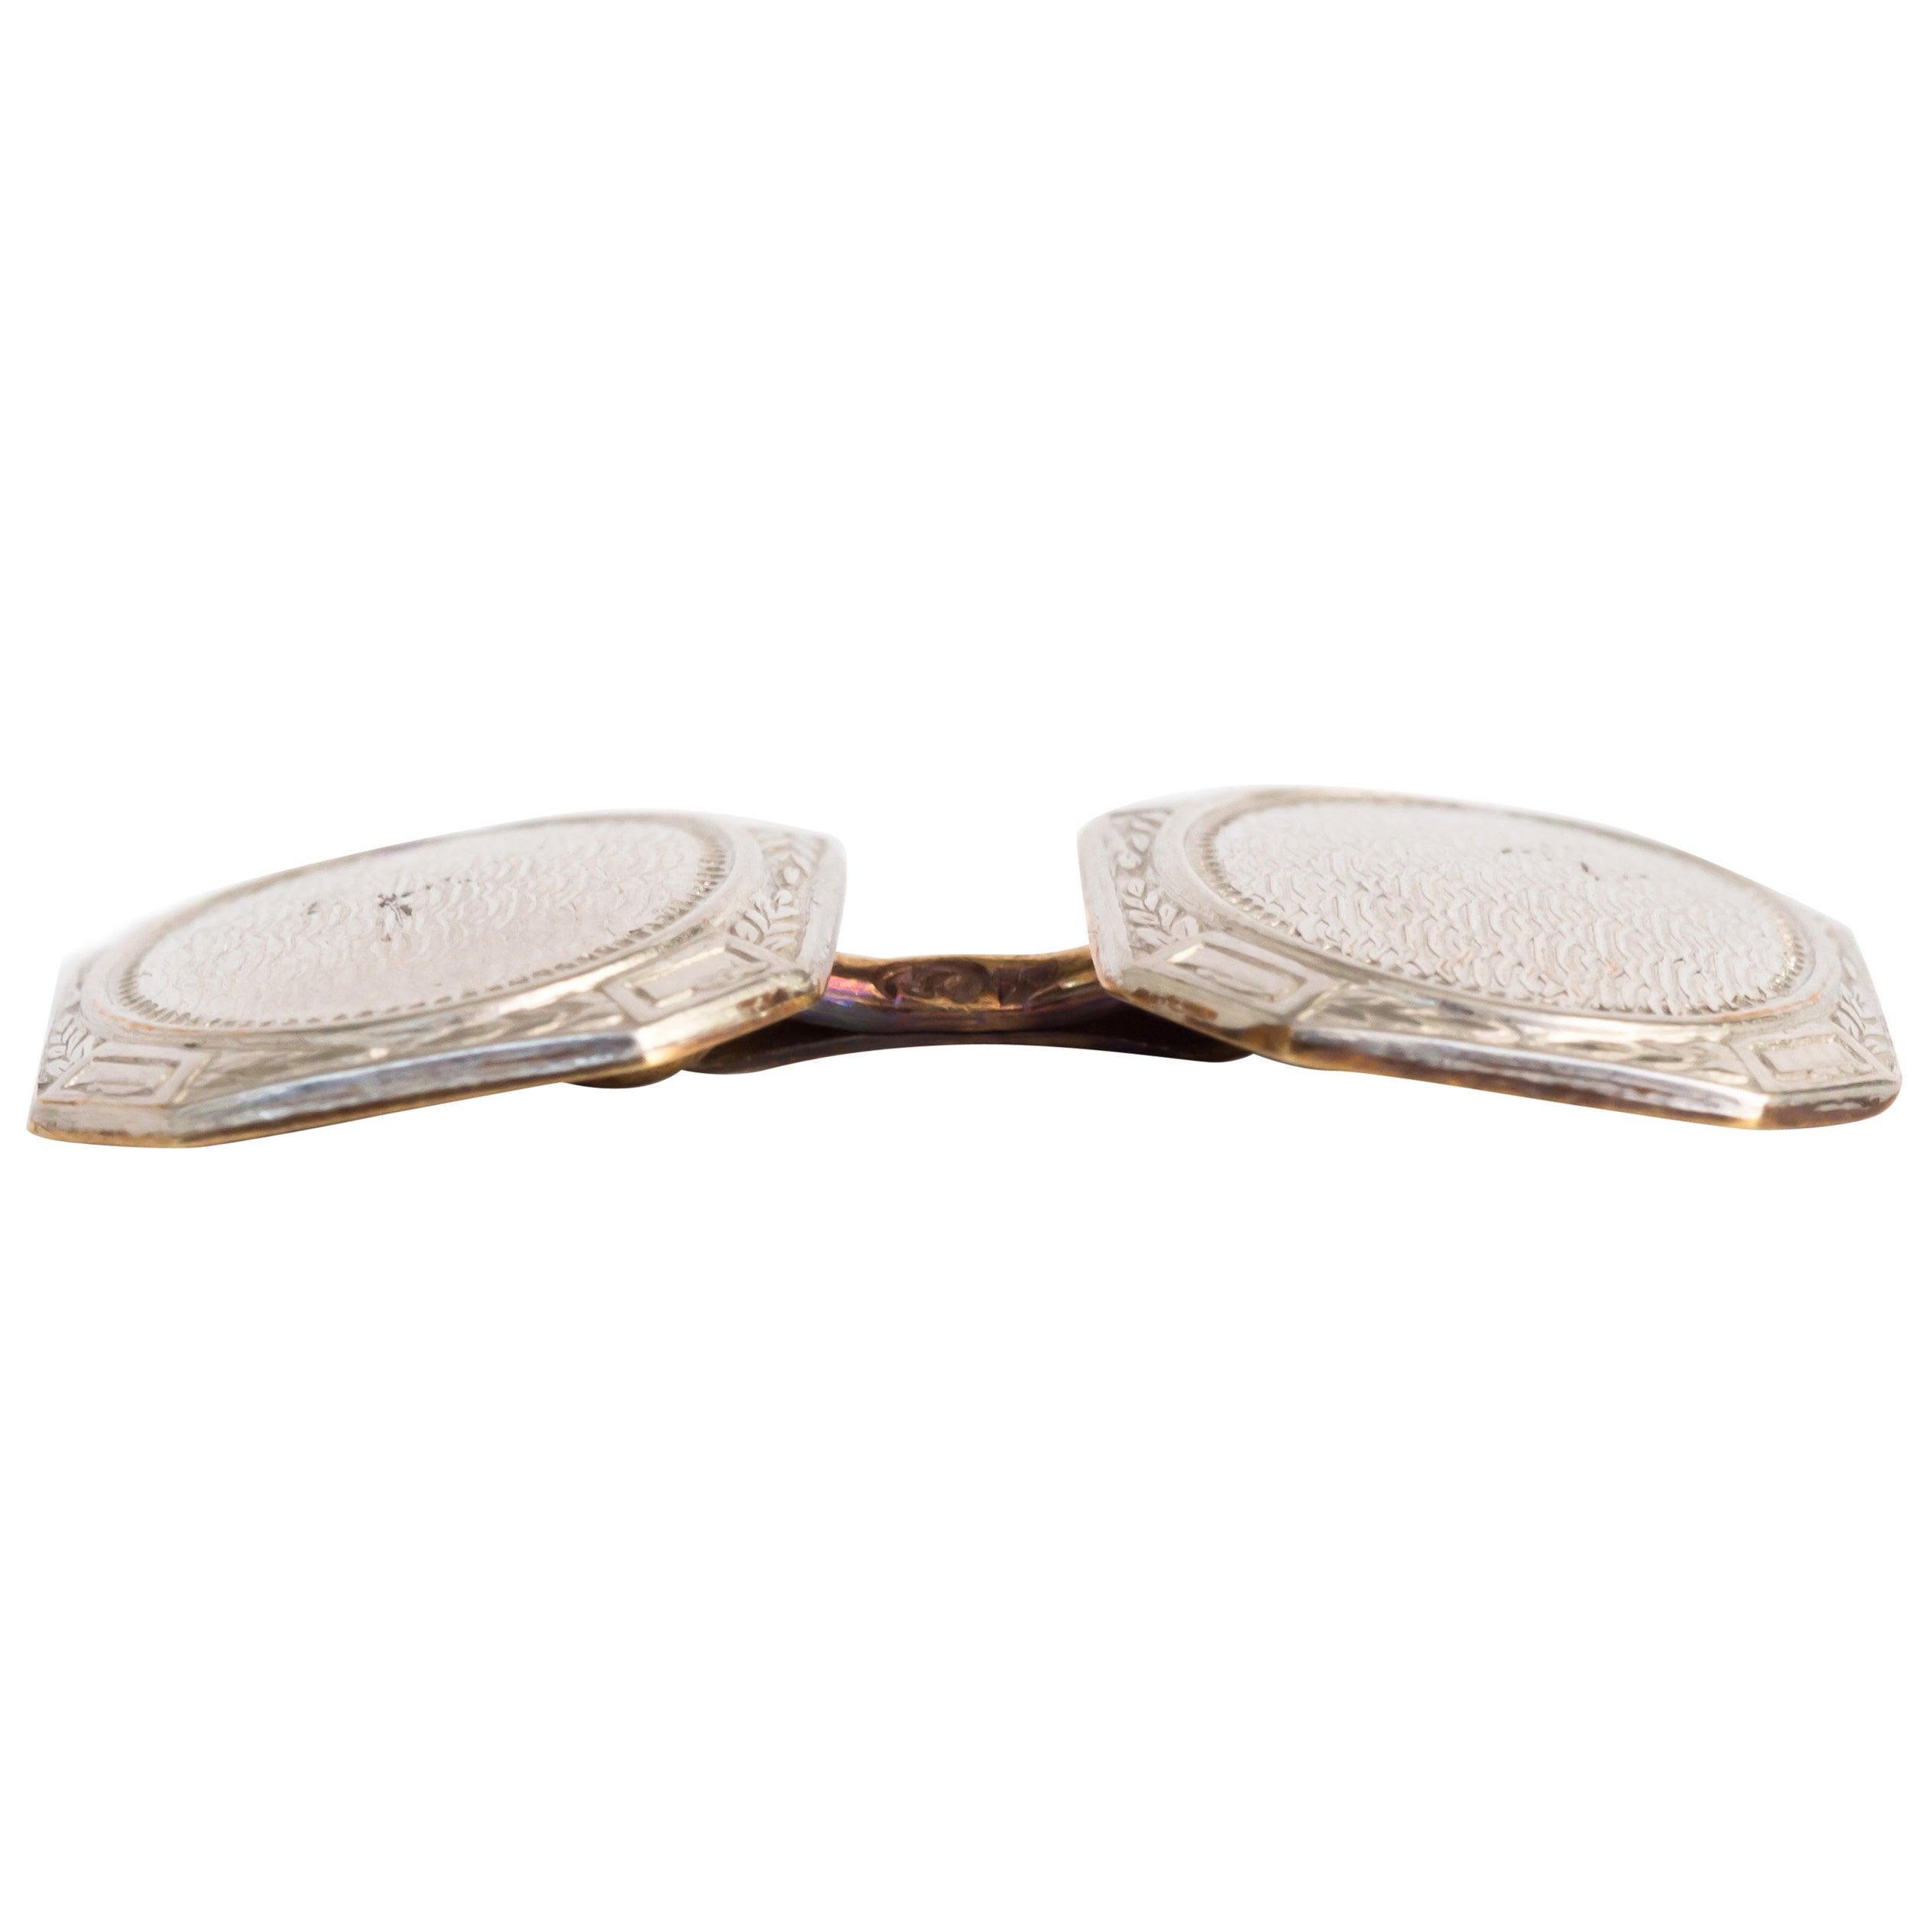 Yellow Gold and Platinum Cufflinks